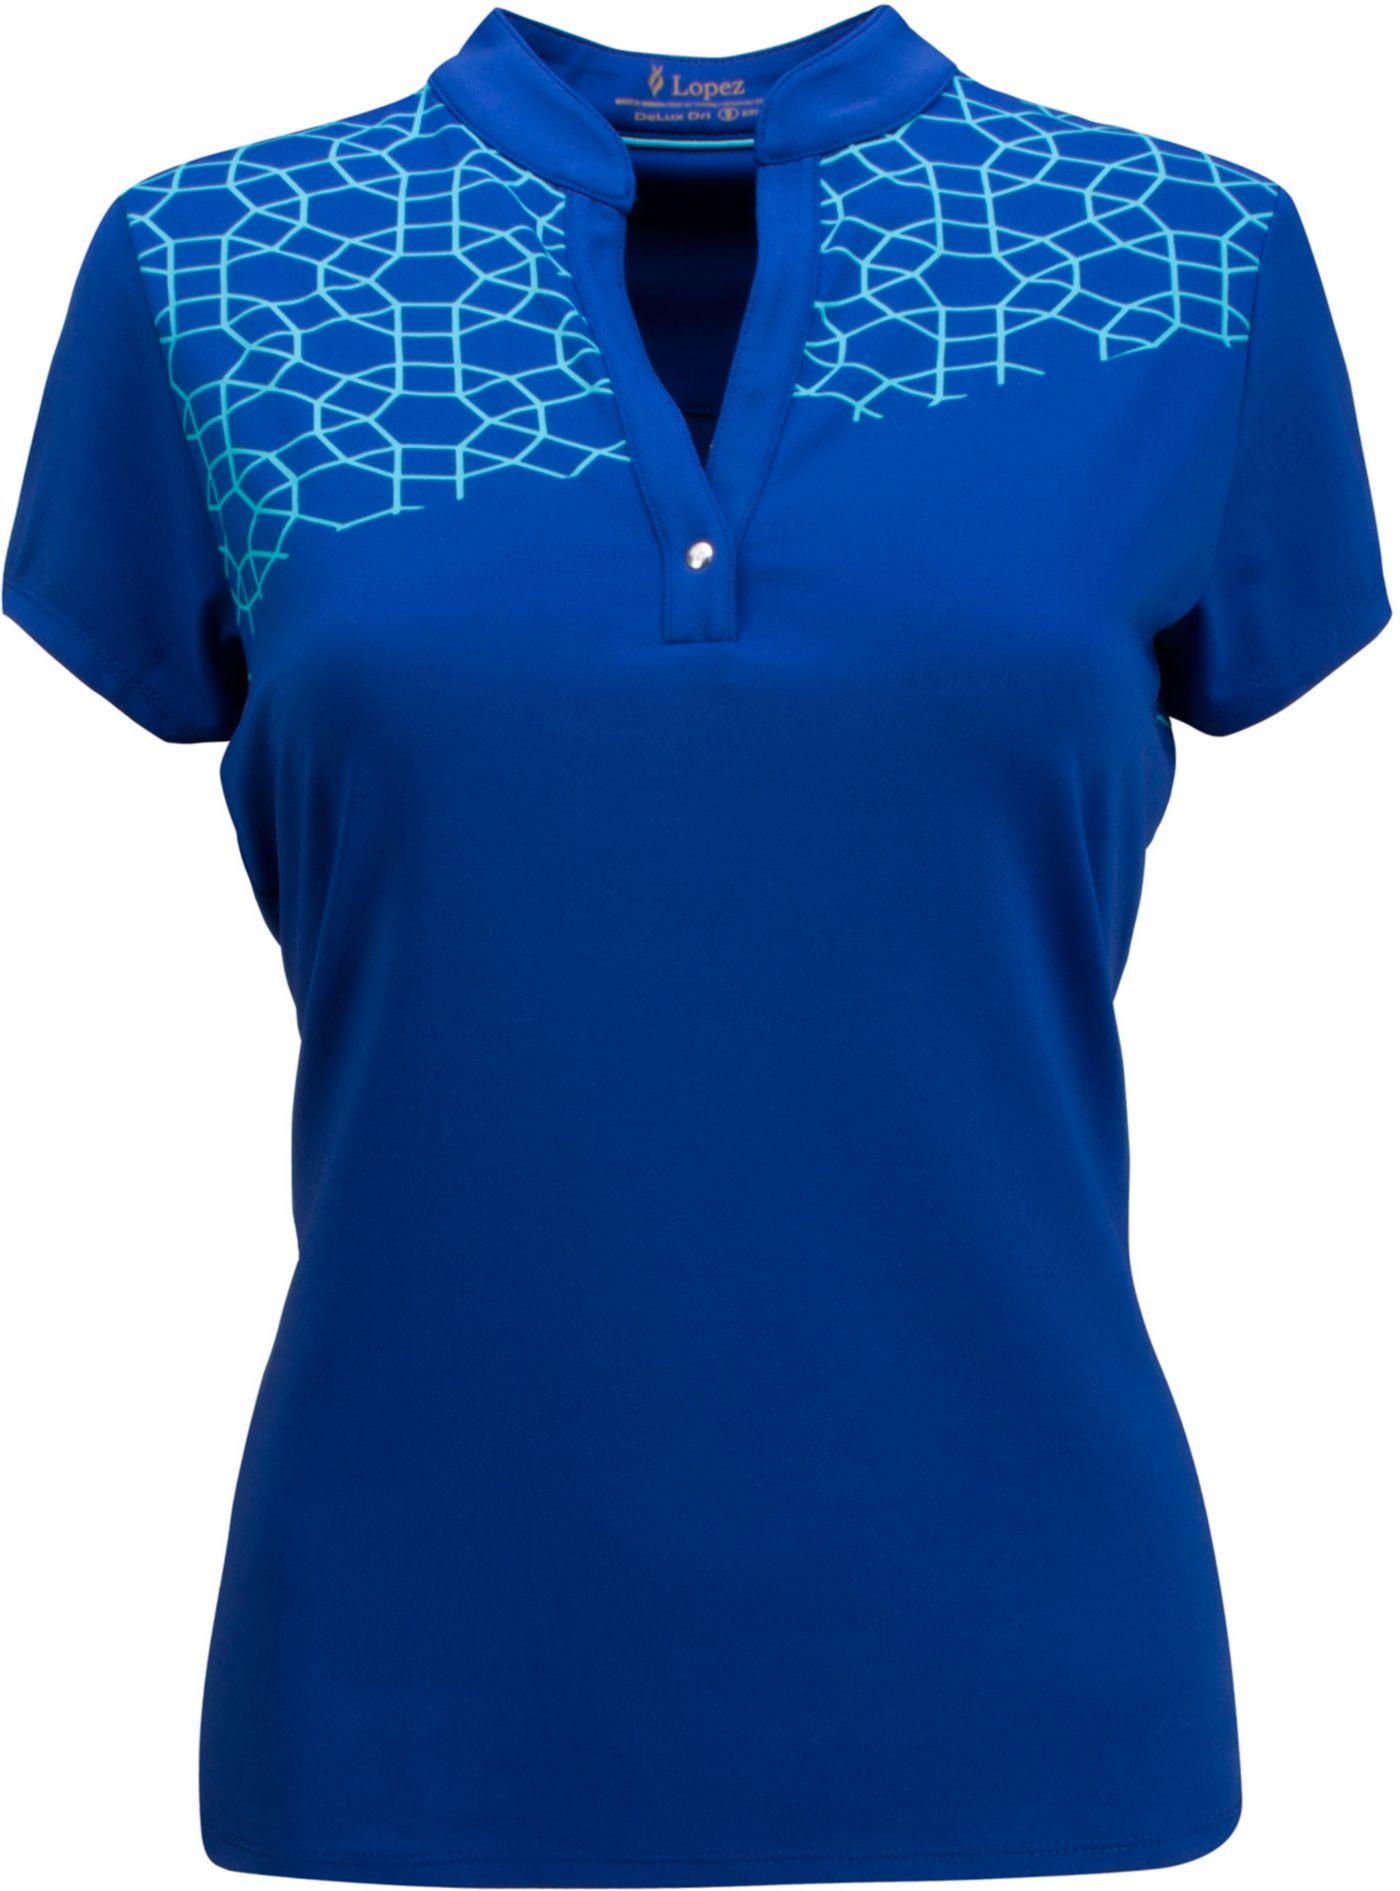 Nancy Lopez Women's Legacy Golf Polo - Extended Sizes